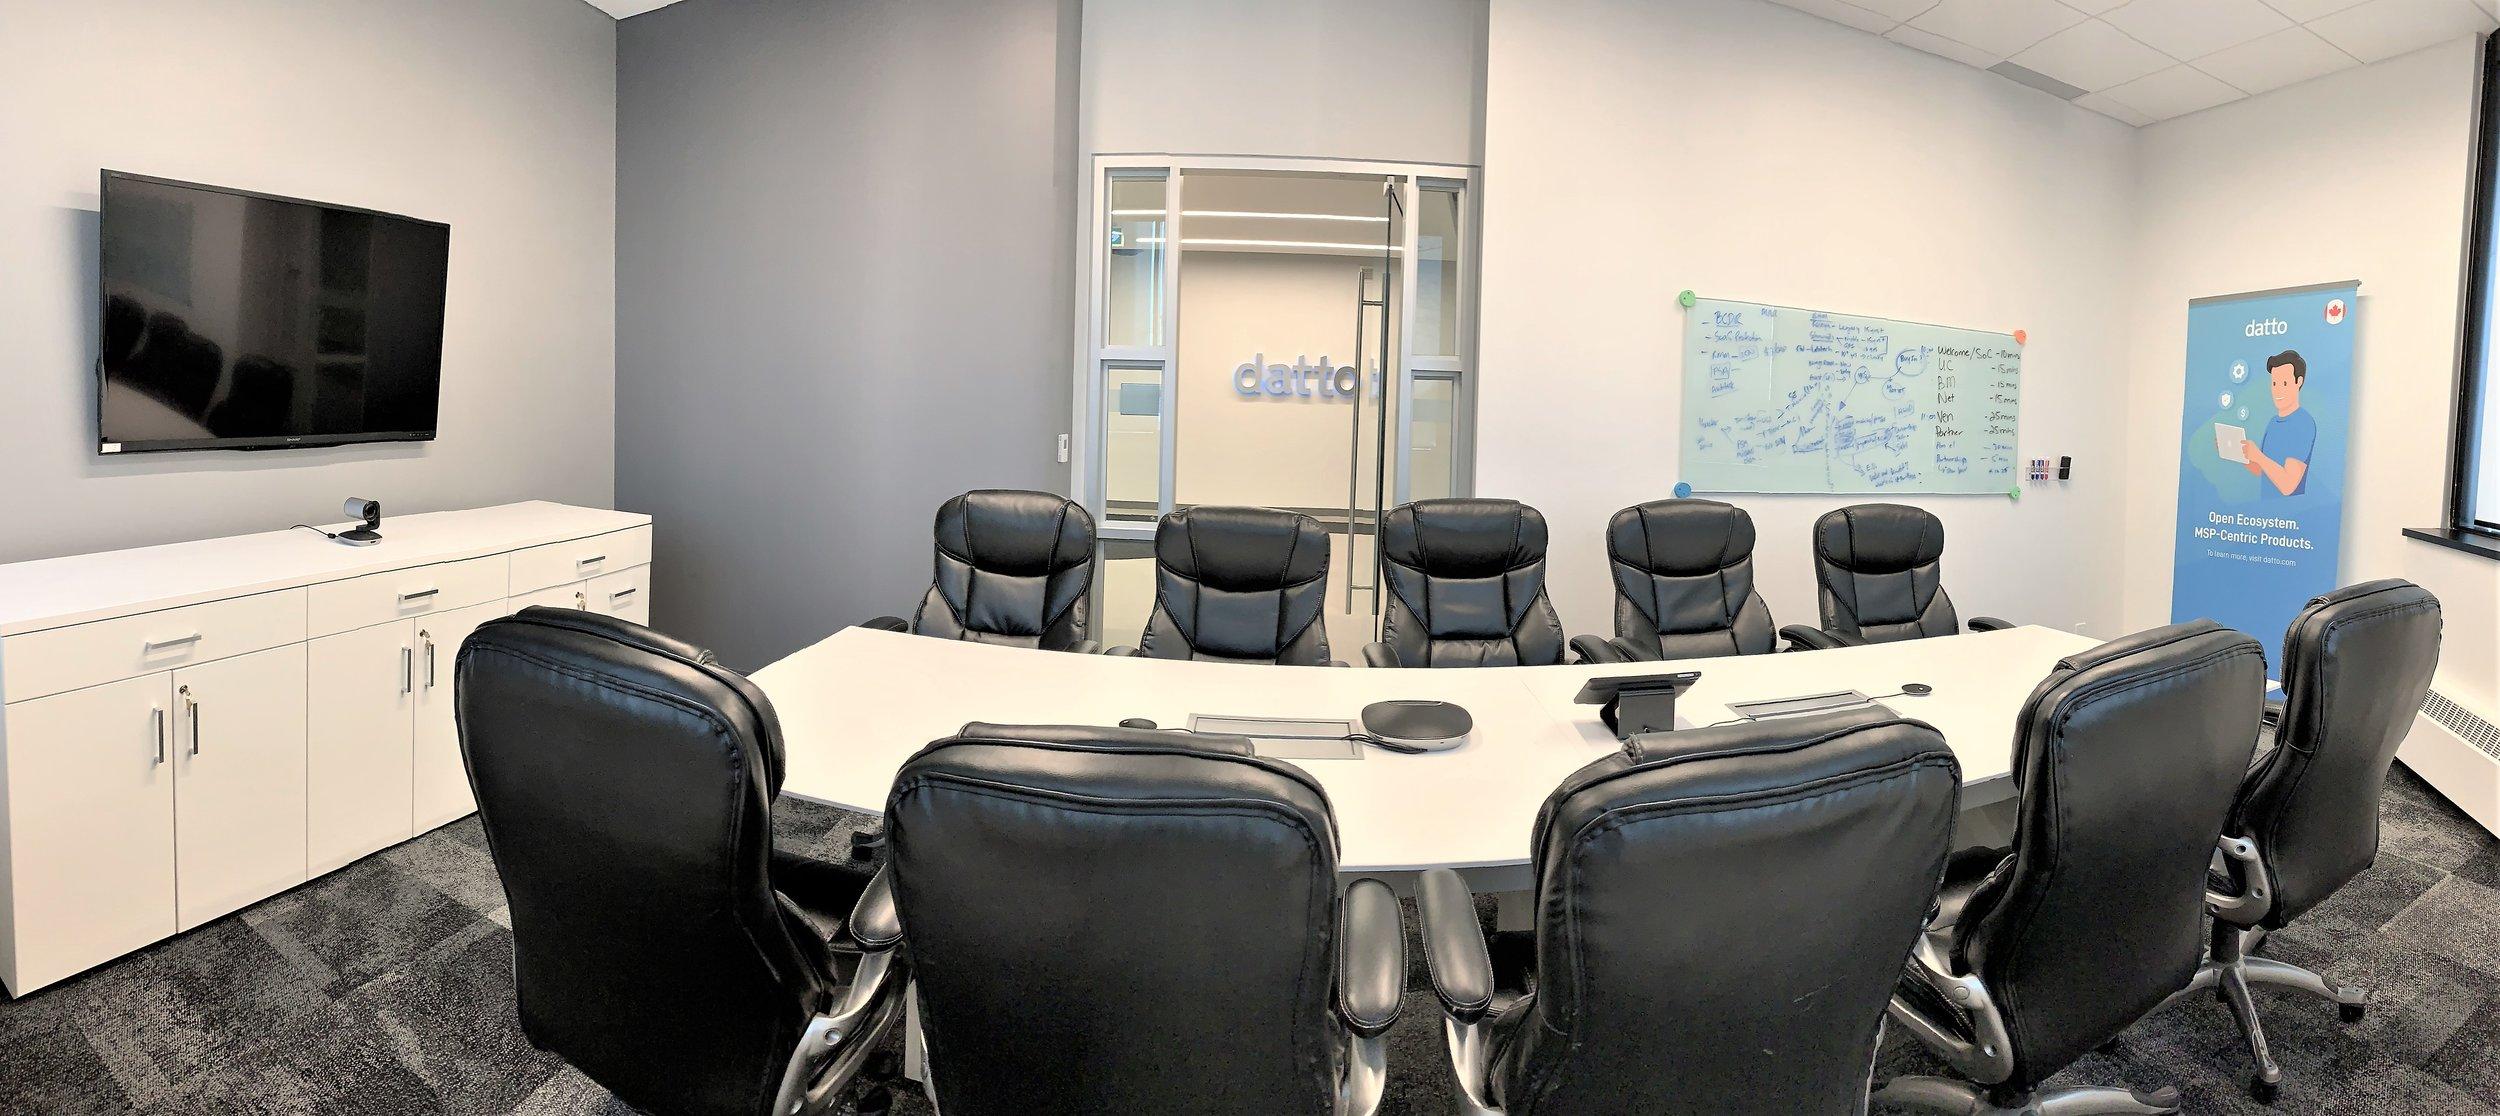 Datto - Boardroom 5.jpeg